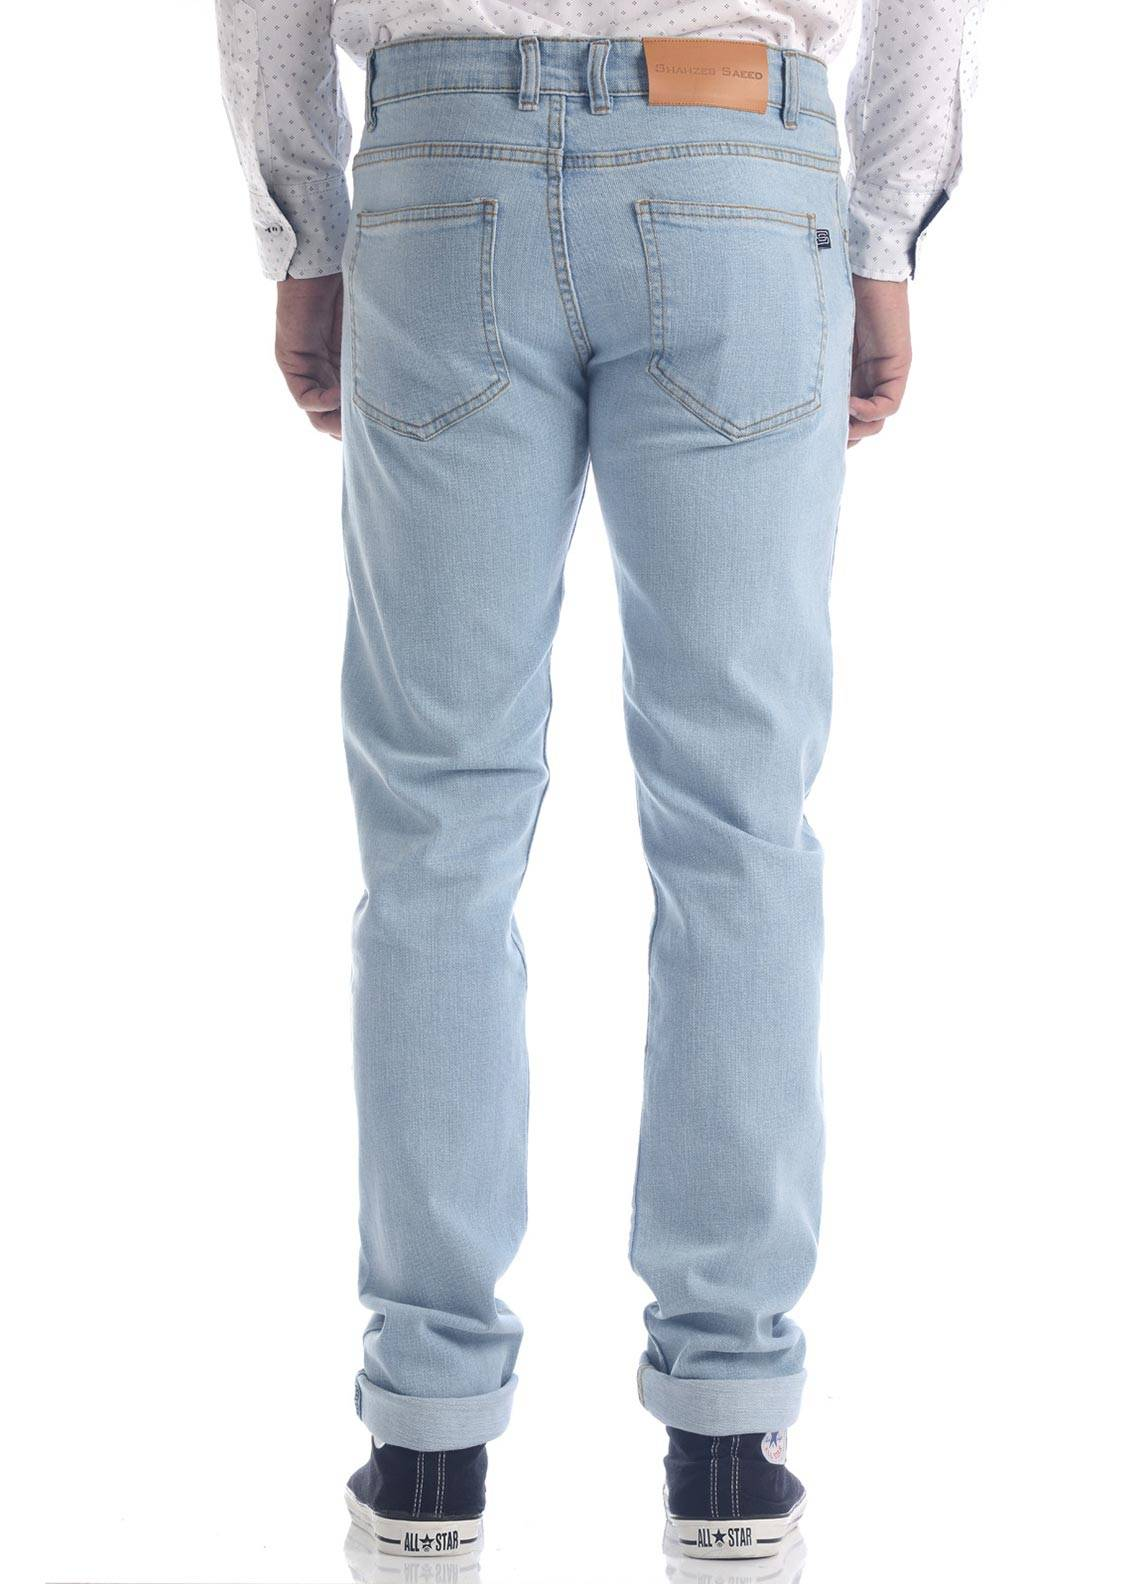 Shahzeb Saeed Denim Casual Men Jeans - Sky Blue DNM-91